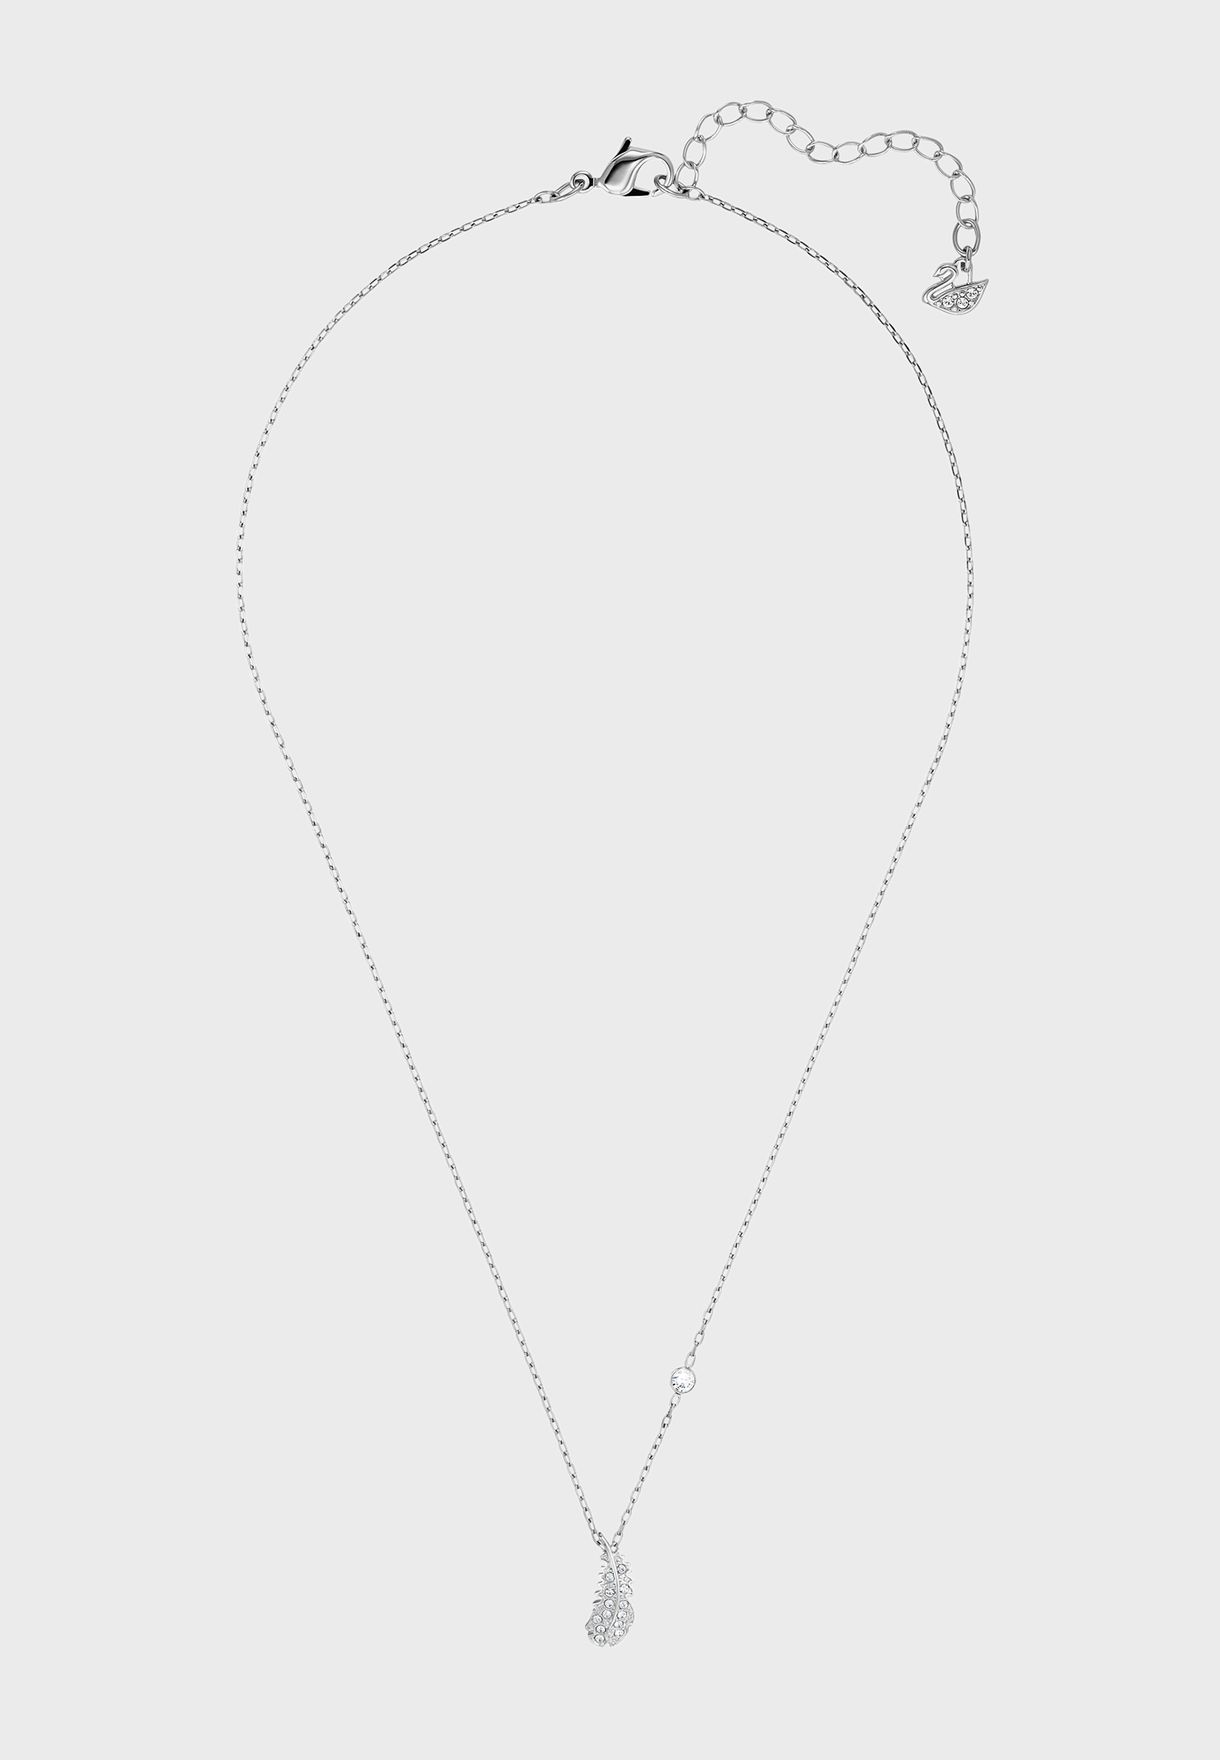 Naughty Mini Pendant Necklace